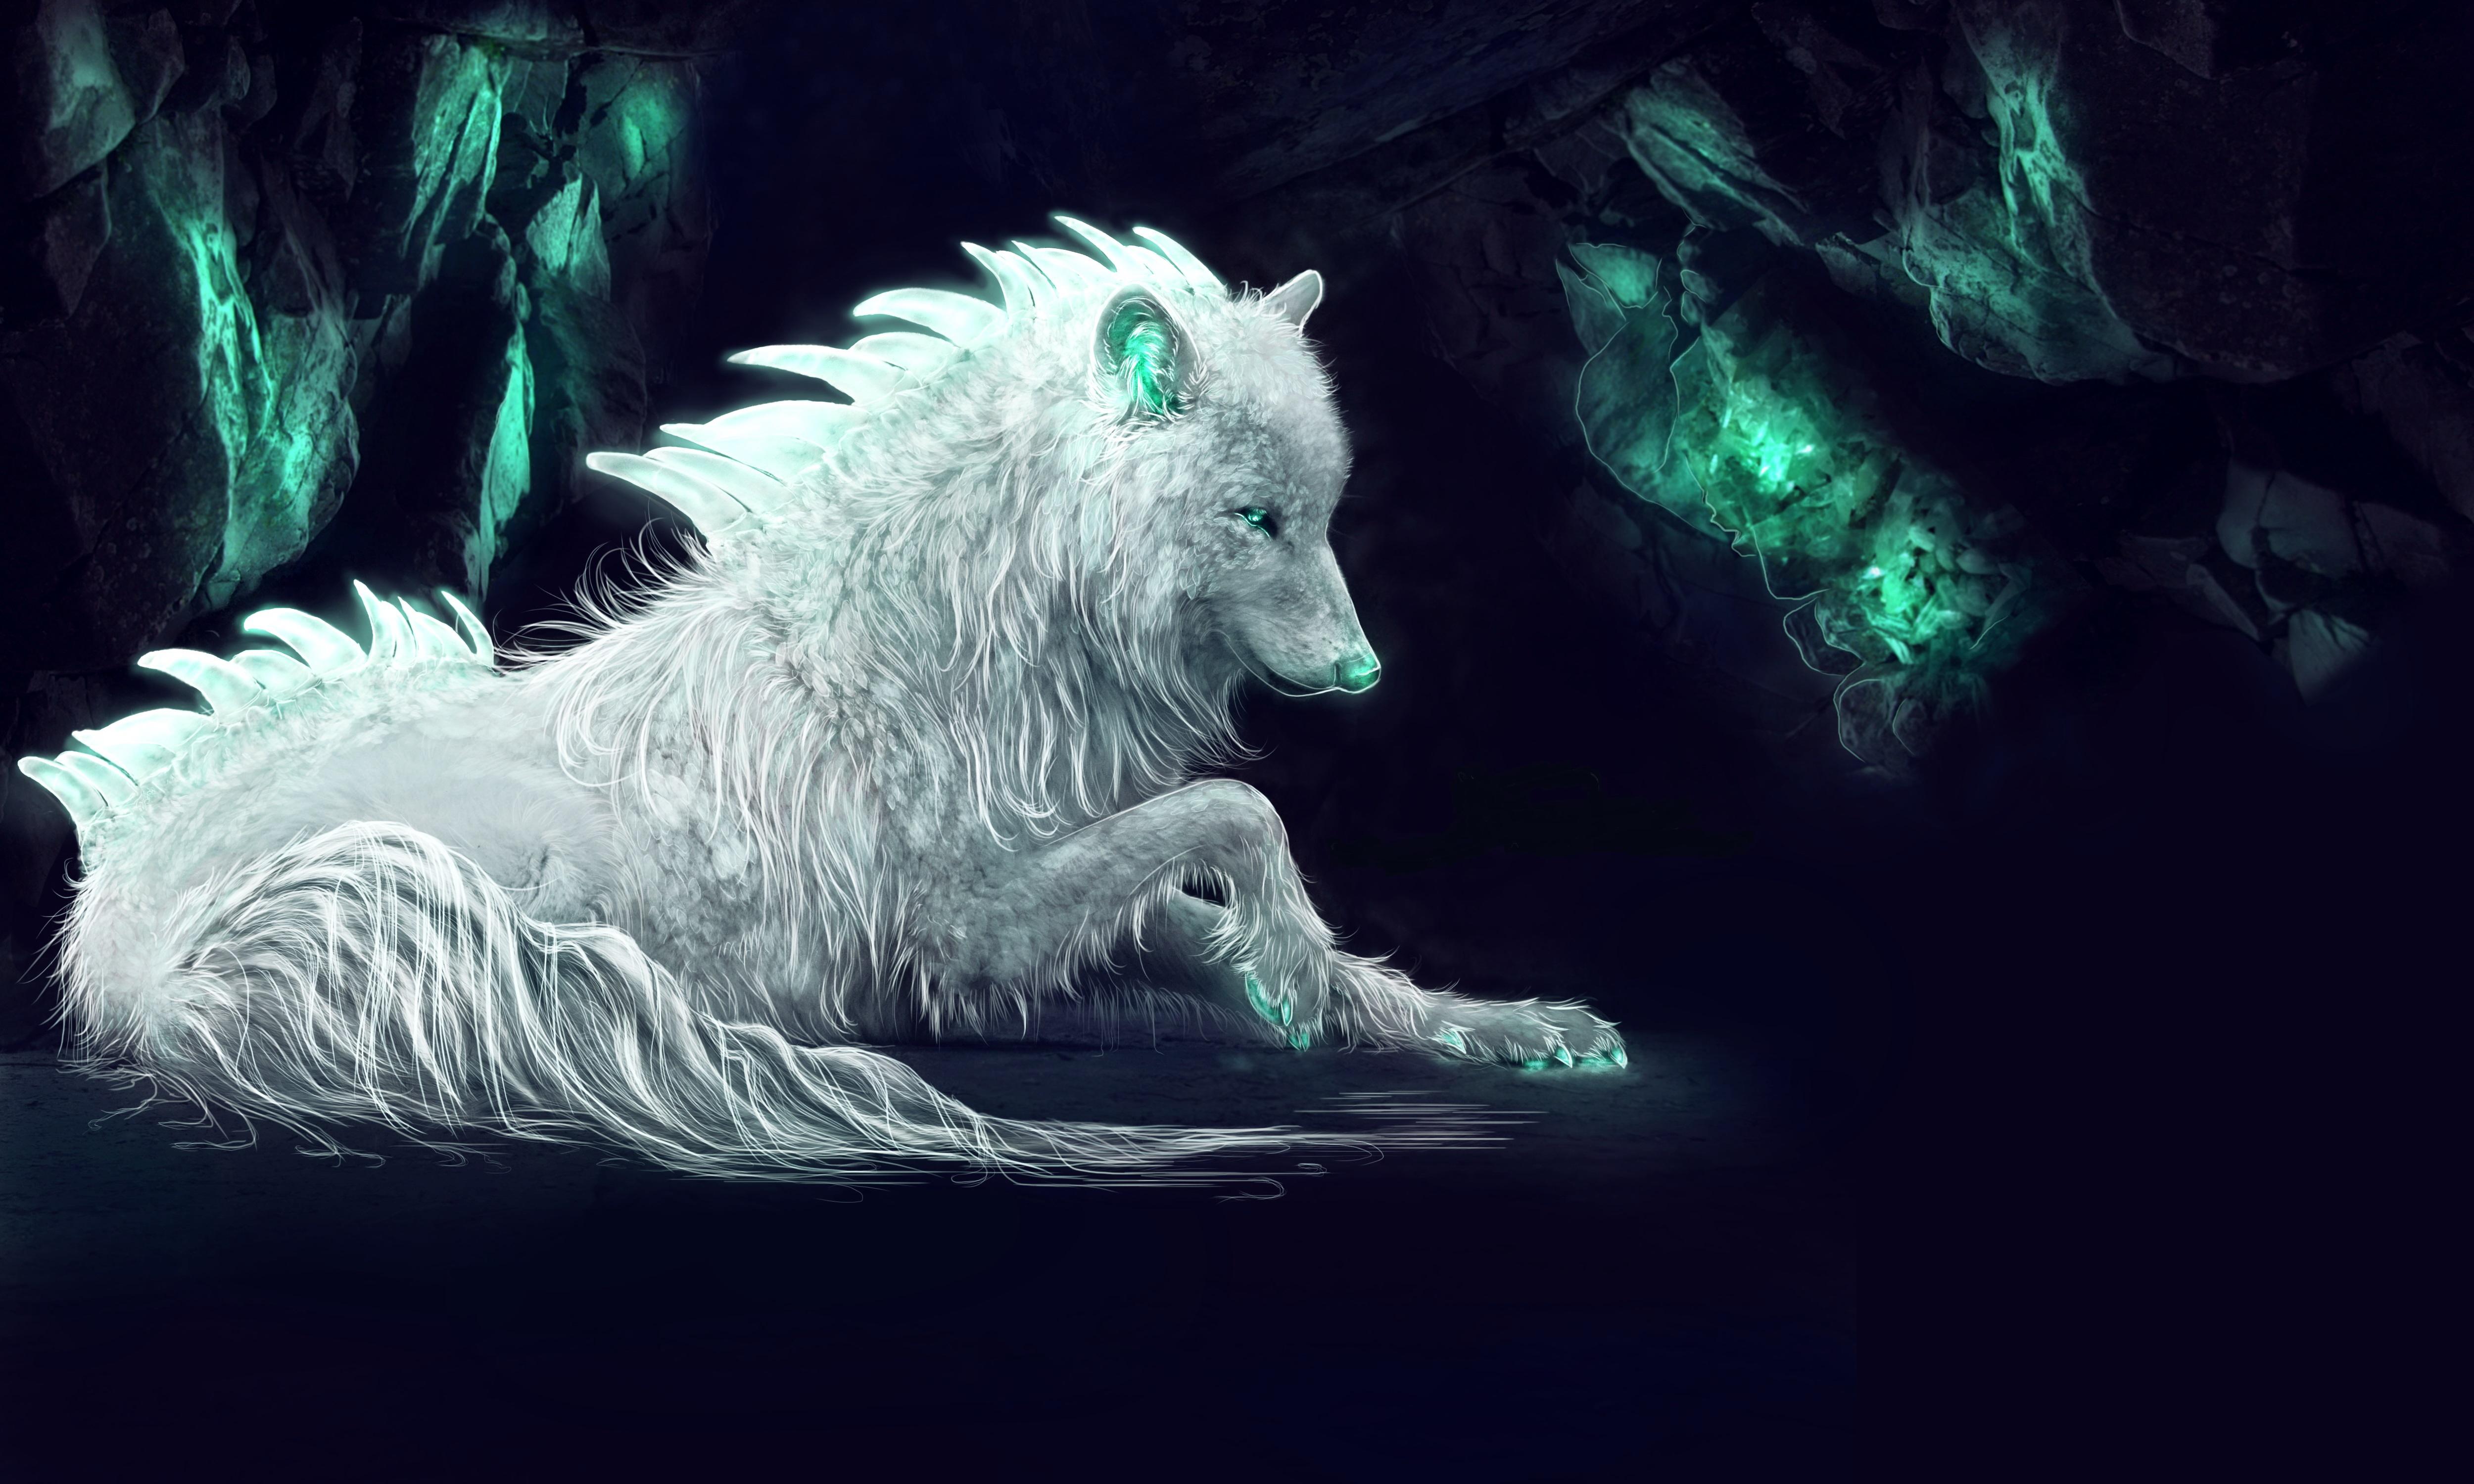 2048x1152 Pubg Fan Art 2048x1152 Resolution Hd 4k: 2048x1152 White Wolf Fan Art 2048x1152 Resolution HD 4k